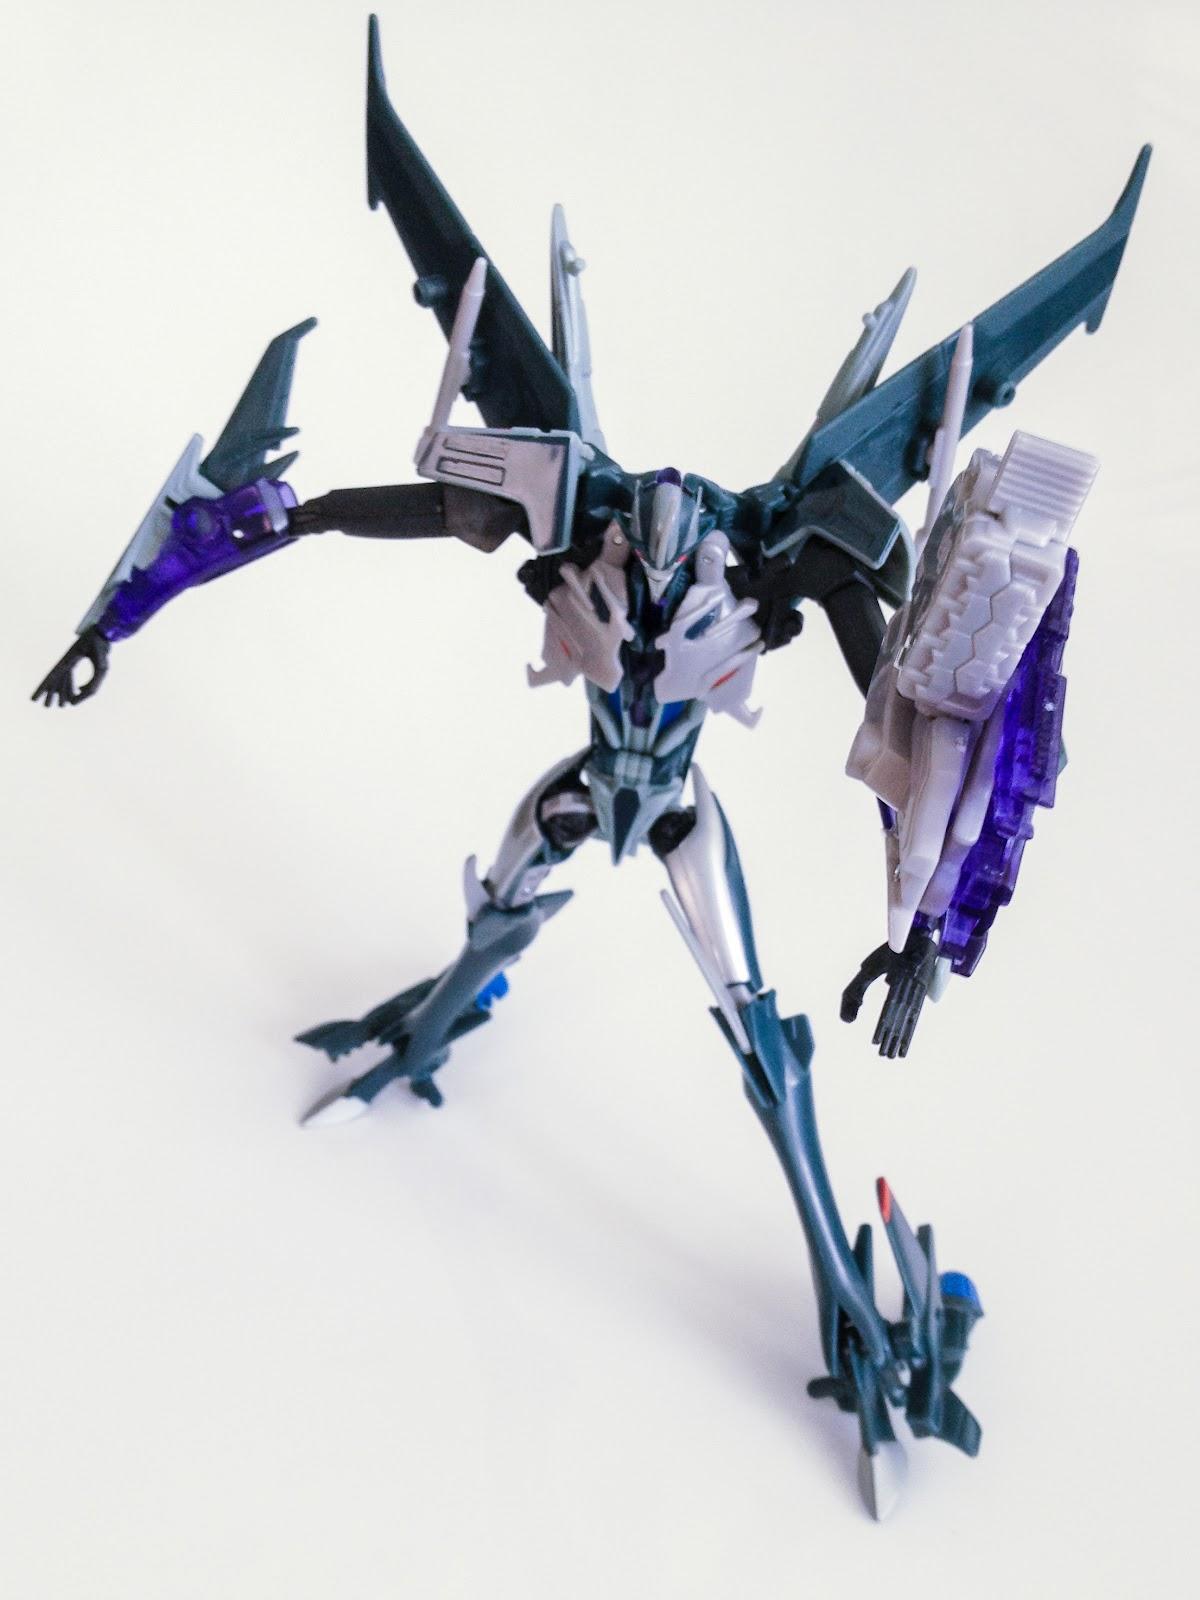 Red Dot Hobbies  Transformers Prime Prid Voyager Starscream